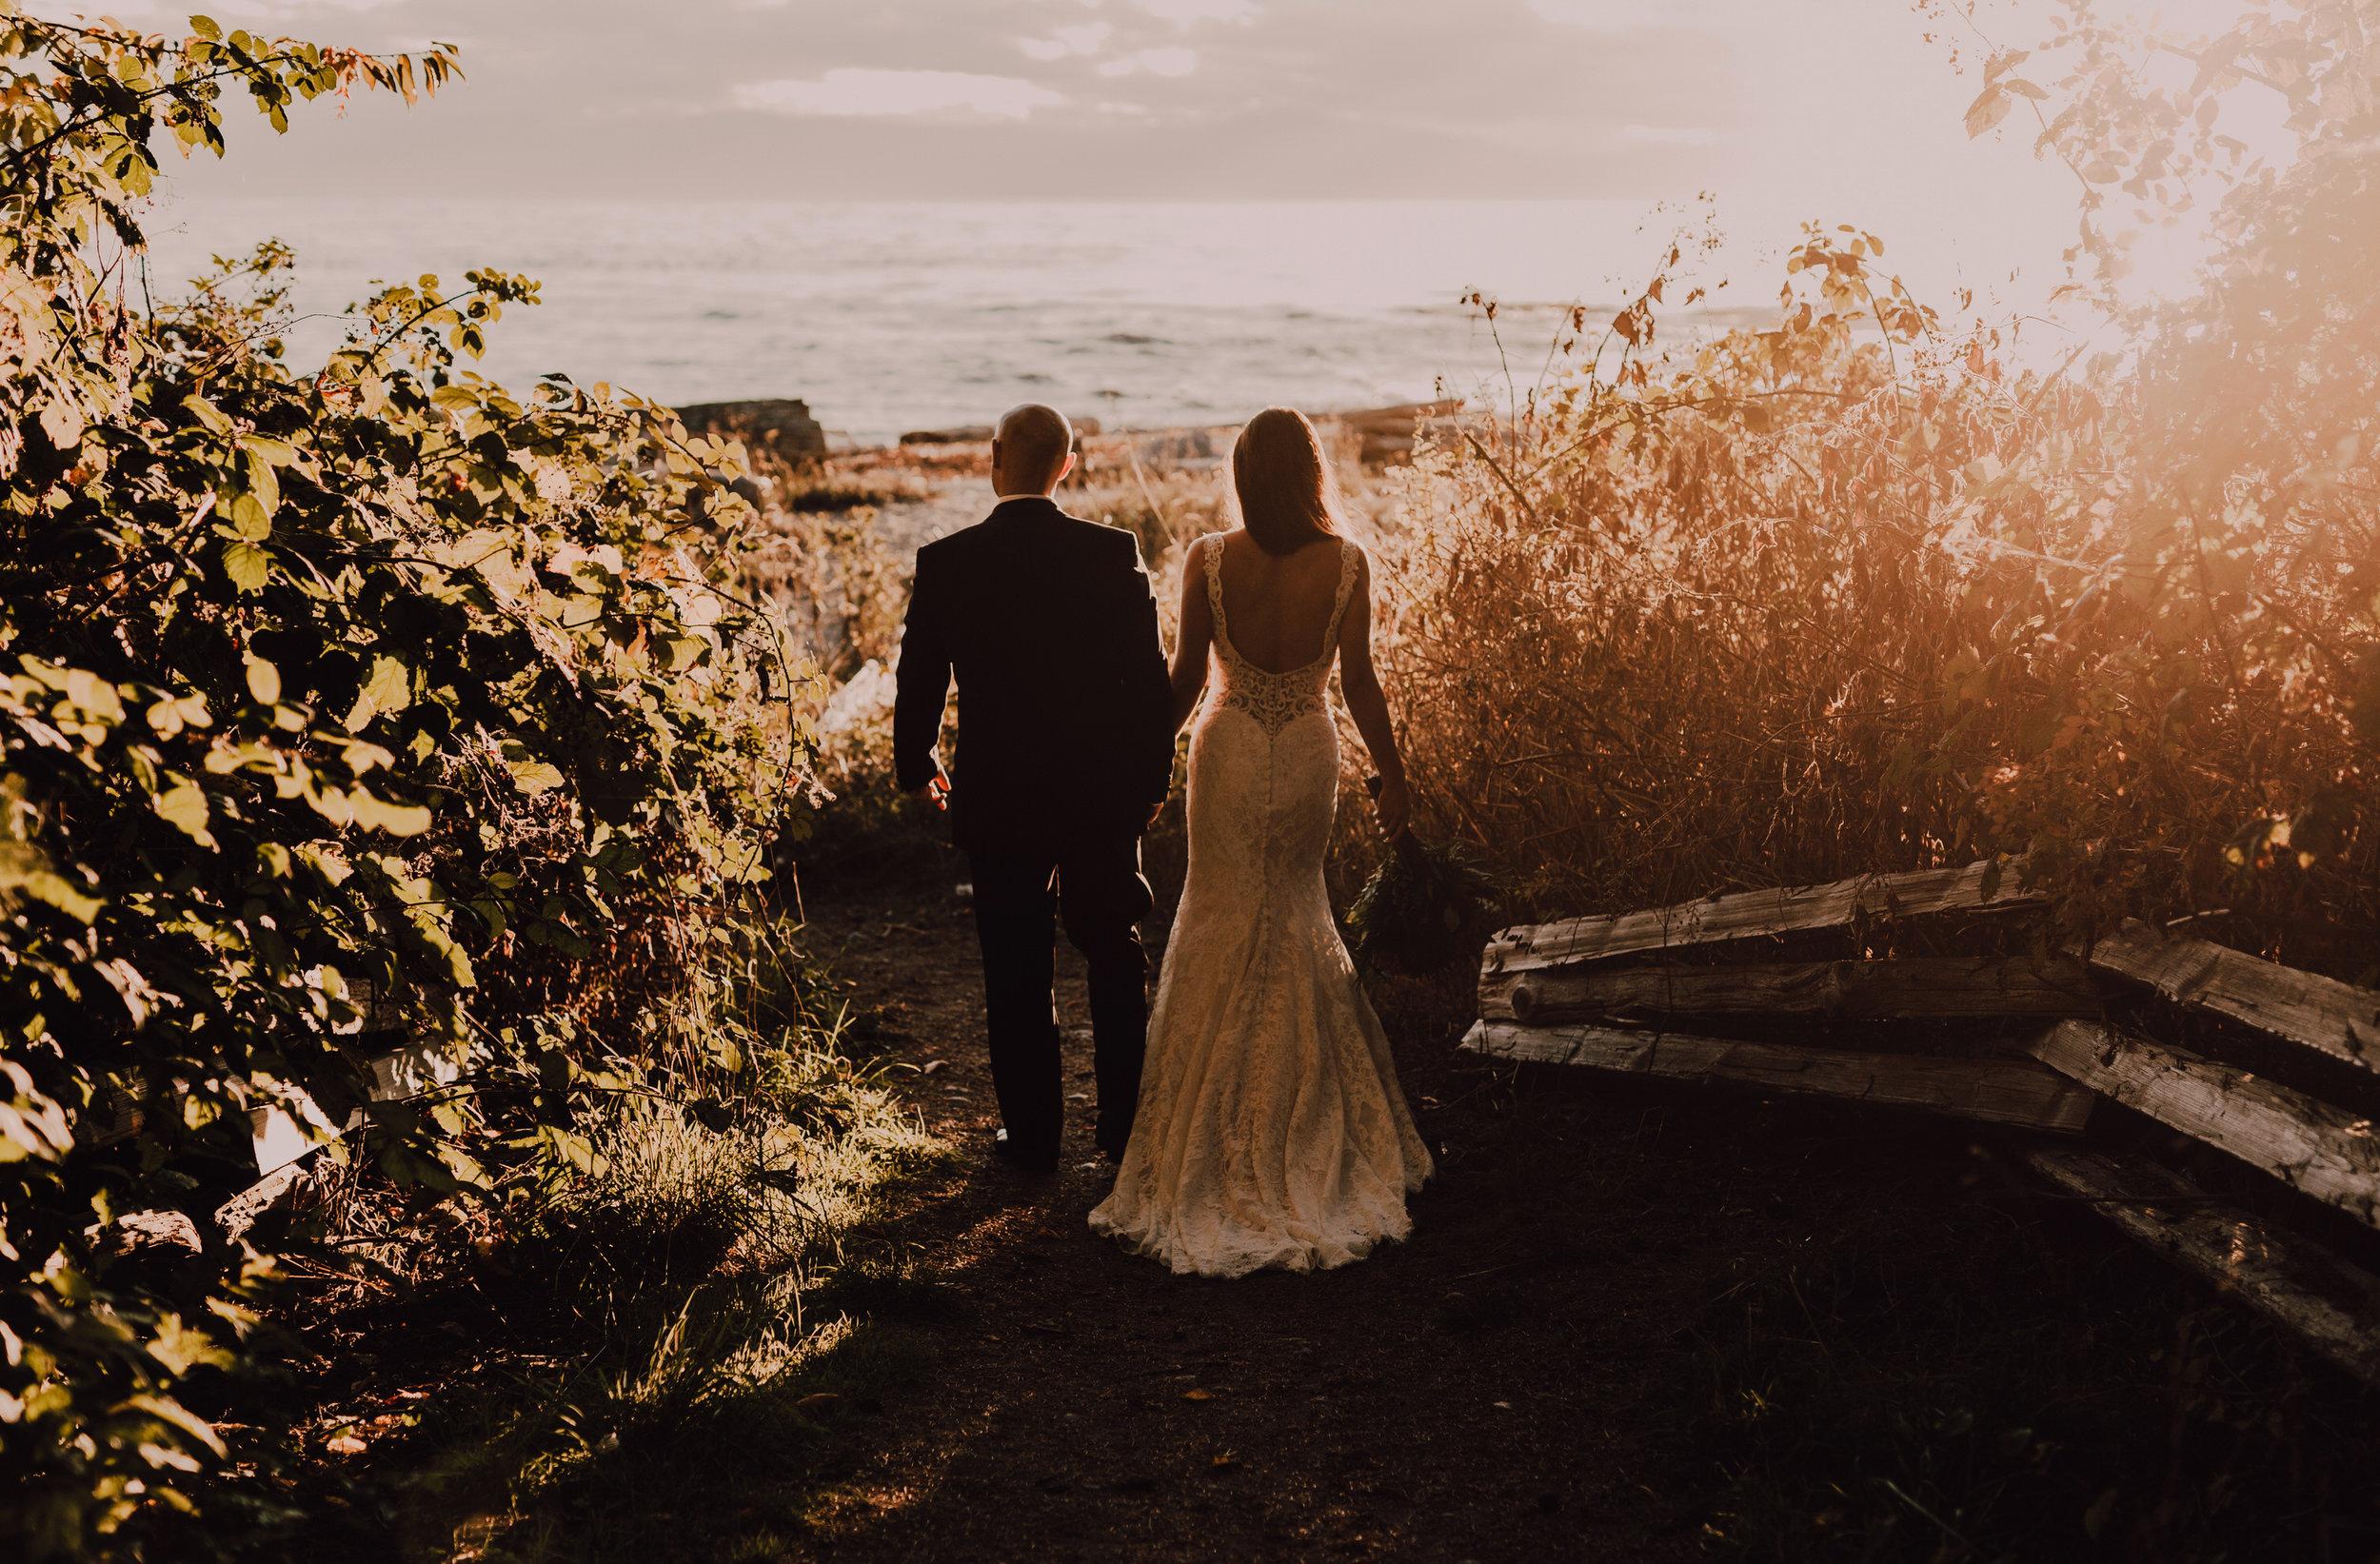 Day After Wedding Photos - Sunshine Coast Wedding Photos - Sunset Wedding Photos - Vancouver Wedding Photographer & Videographer - Sunshine Coast Wedding Photos - Sunshine Coast Wedding Photographer - Jennifer Picard Photography - 1A5A8933.jpg